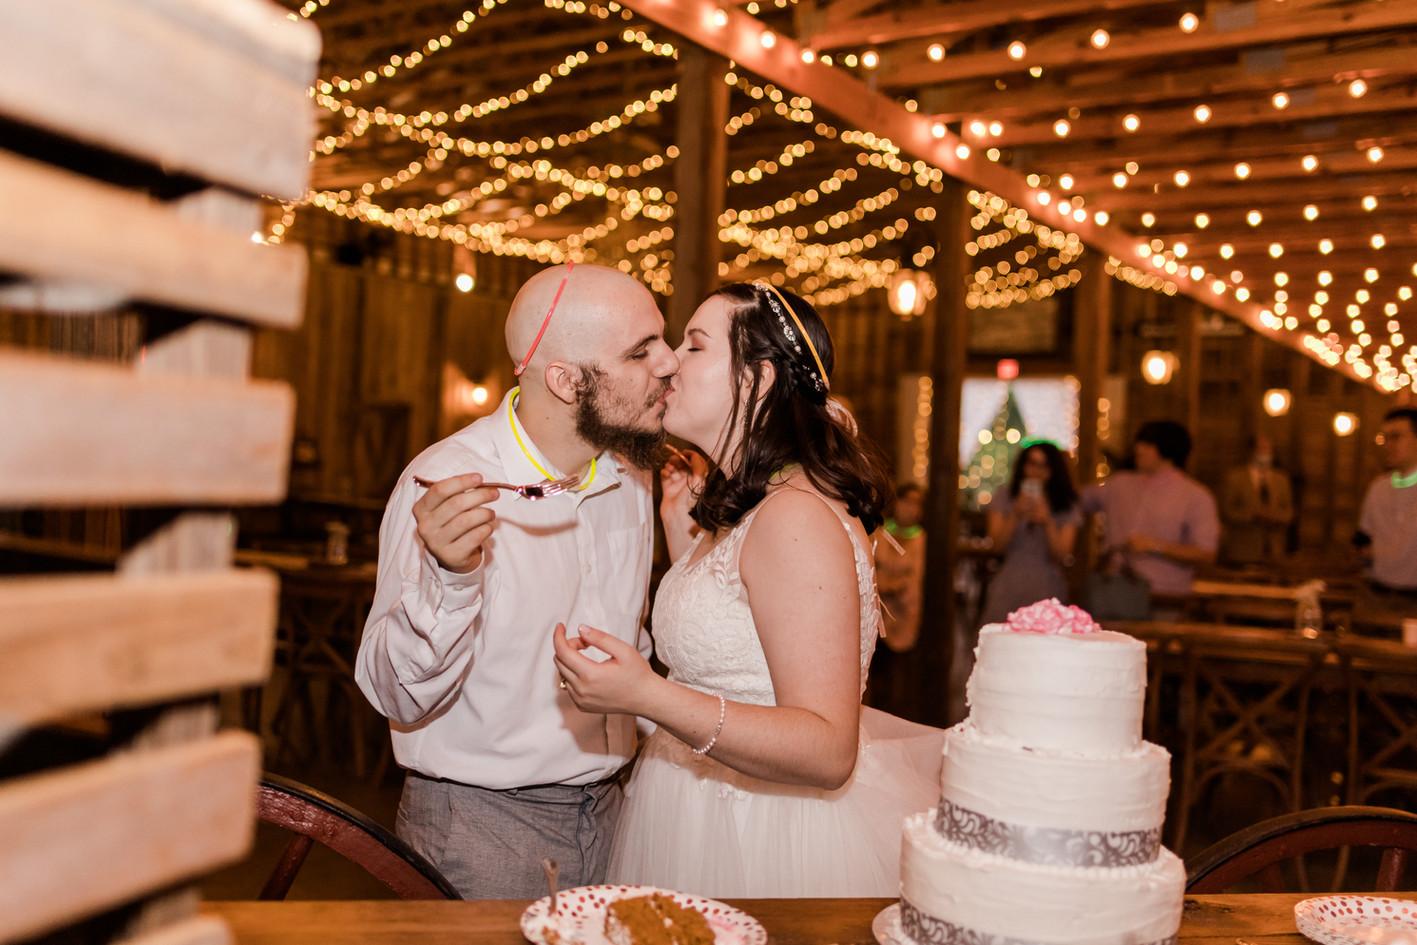 Clara & John kissing by cake